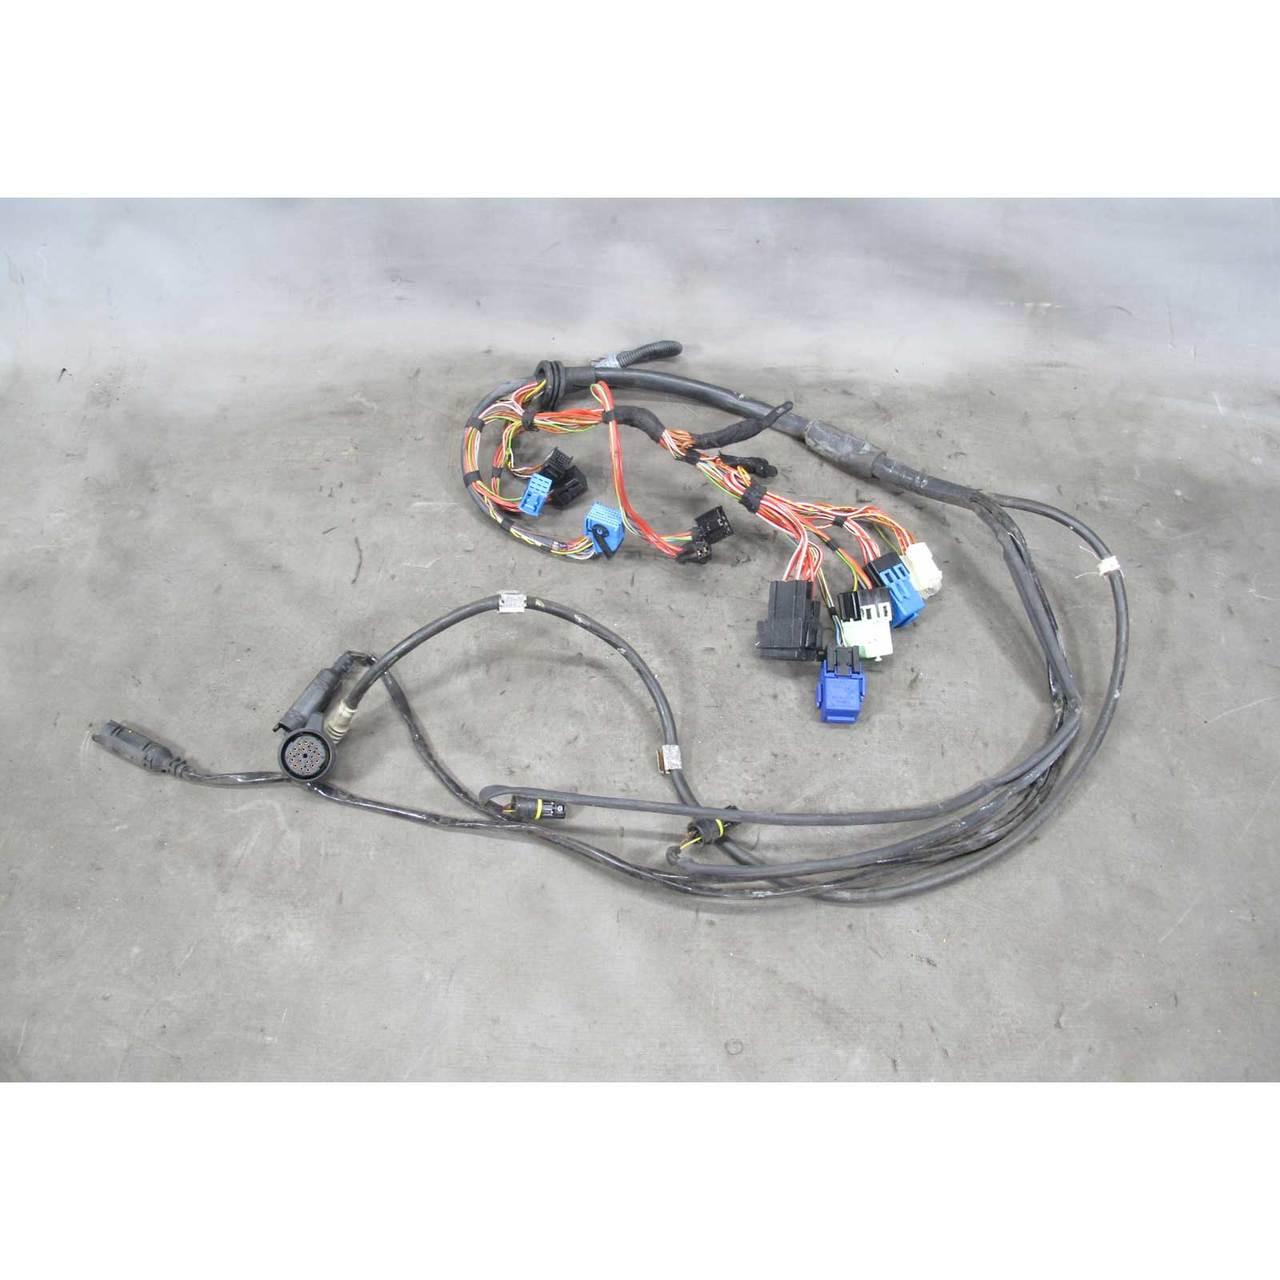 medium resolution of  2001 2002 bmw e46 x drive m54 automatic transmission wiring harness on bmw led